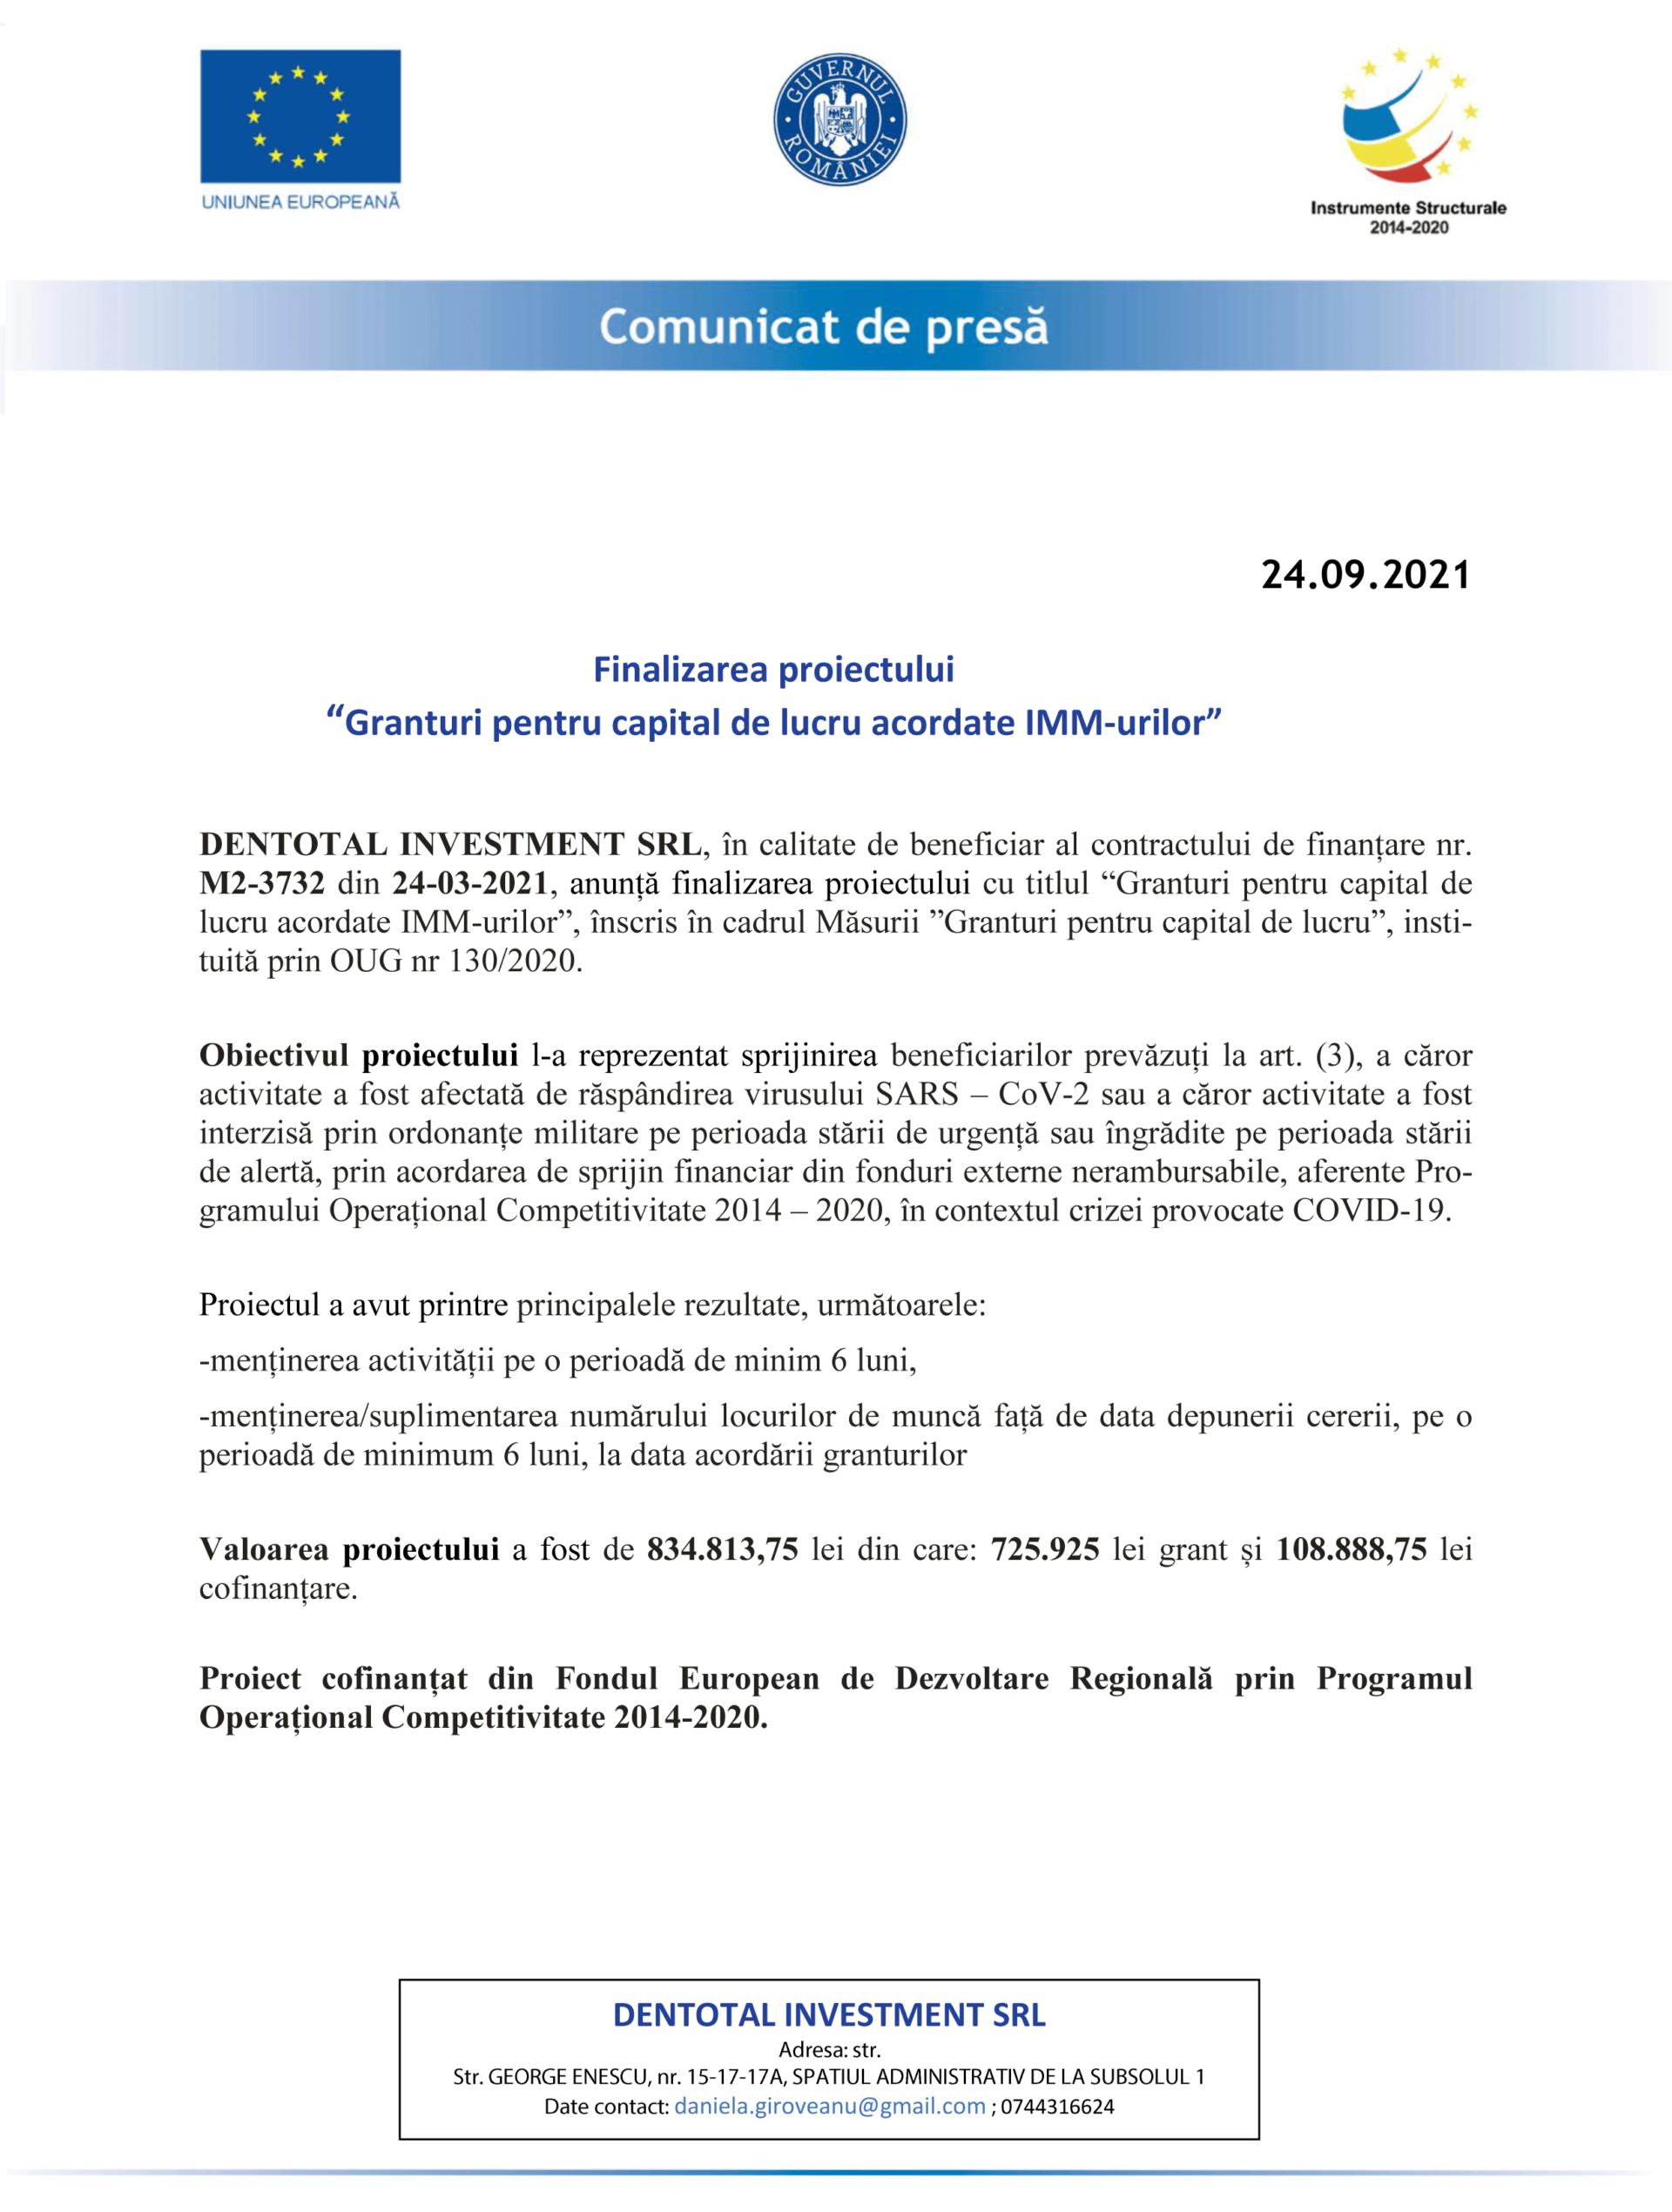 Comunicat-de-presa-finalizare-M2---DENTOTAL-INVESTMENT